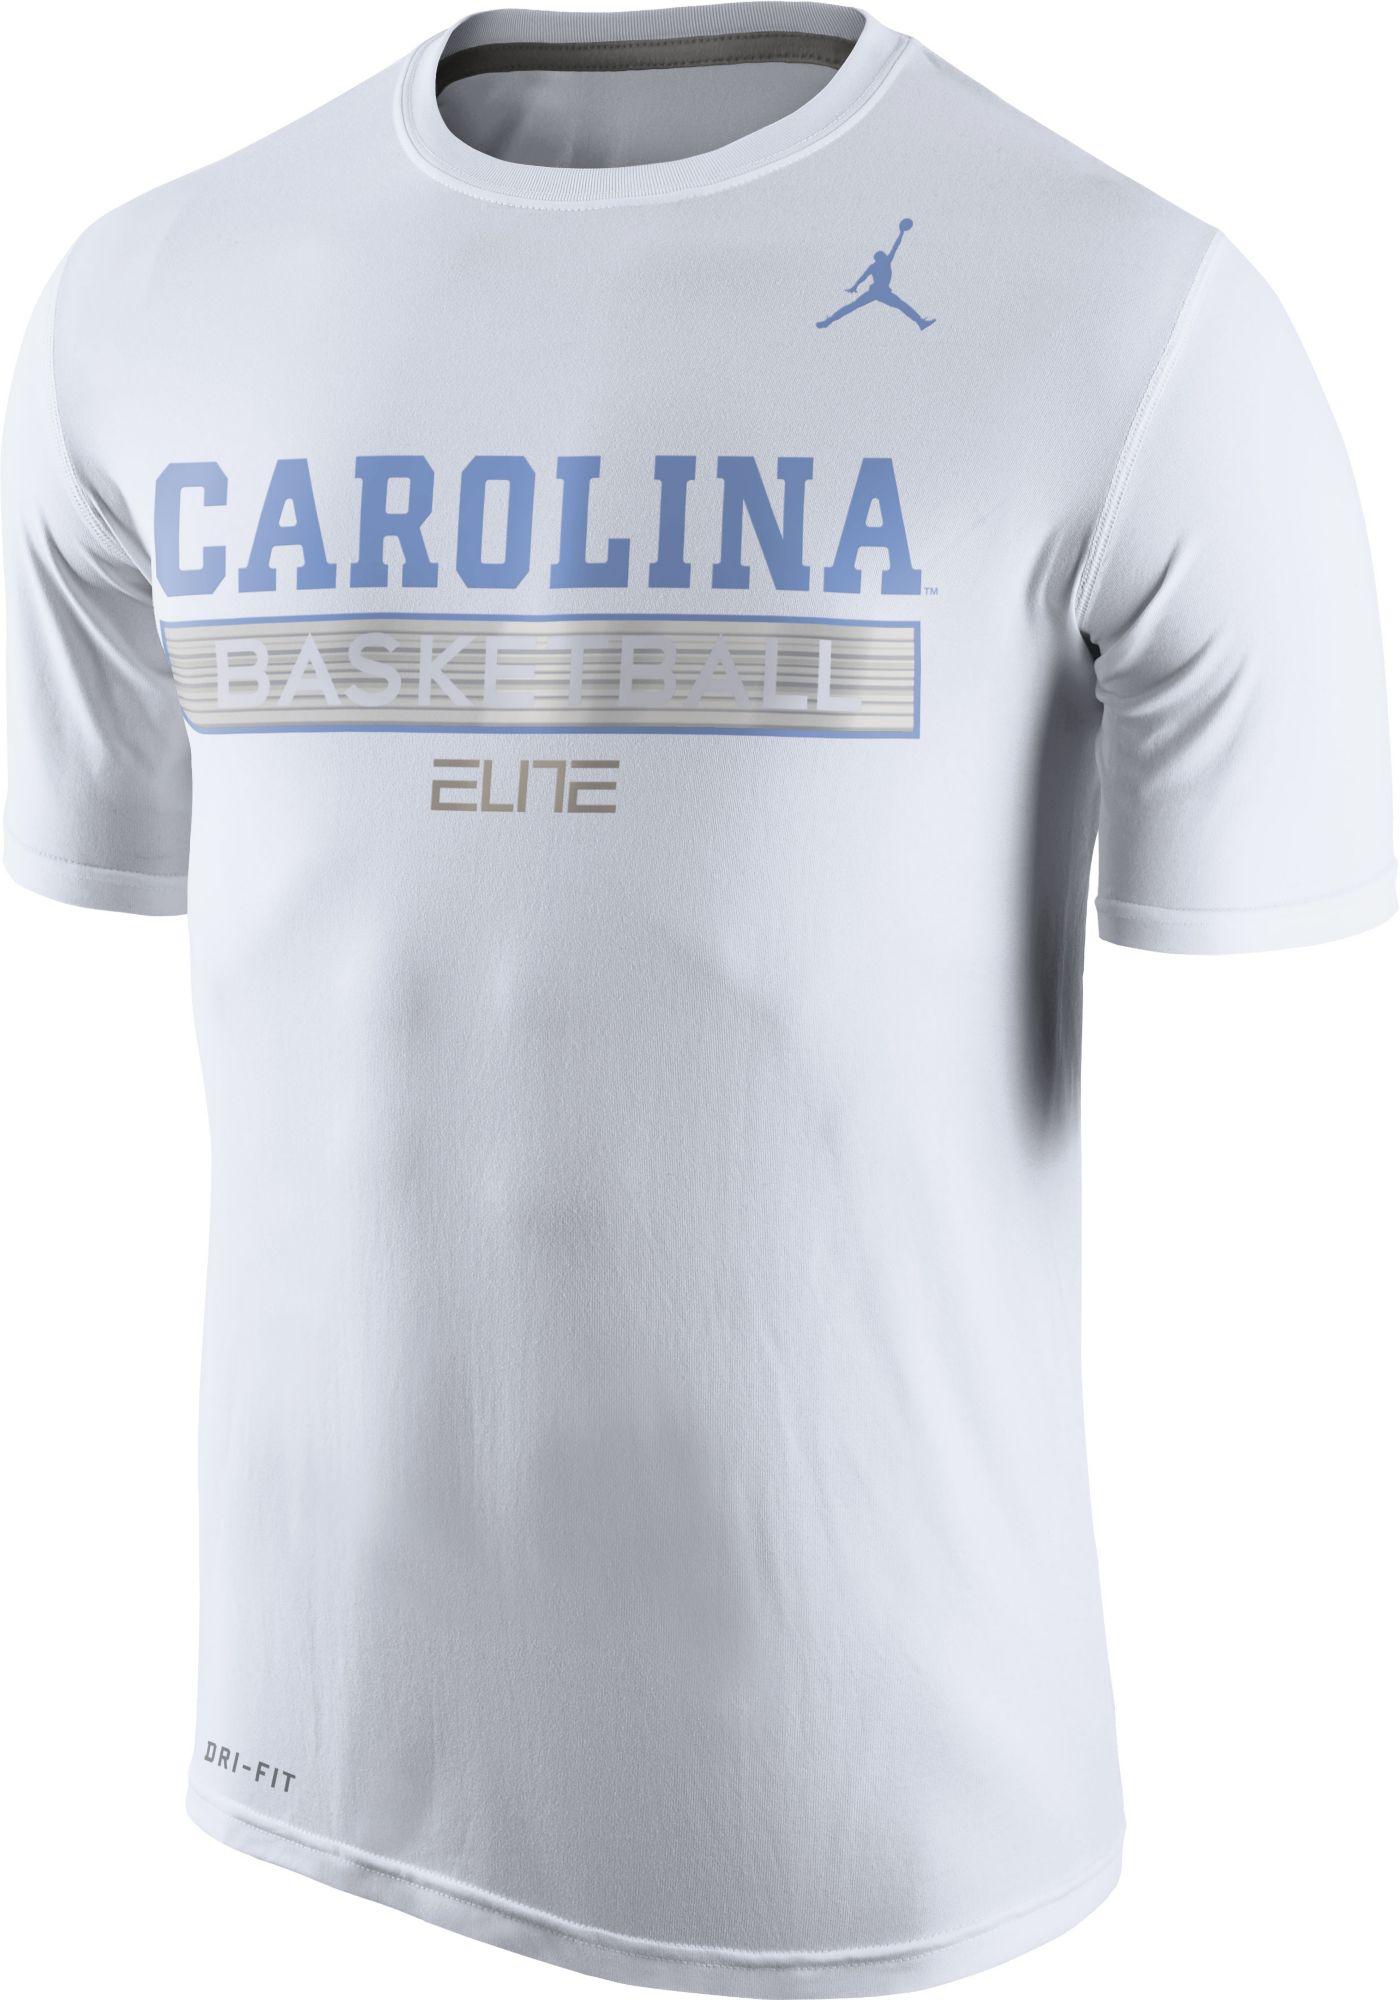 9b80dd92fc3 ... Product Image · Jordan Mens North Carolina Tar Heels ELITE Basketball  Practice White T-Shirt Nike North Carolina Tar Heels 23 Michael ...